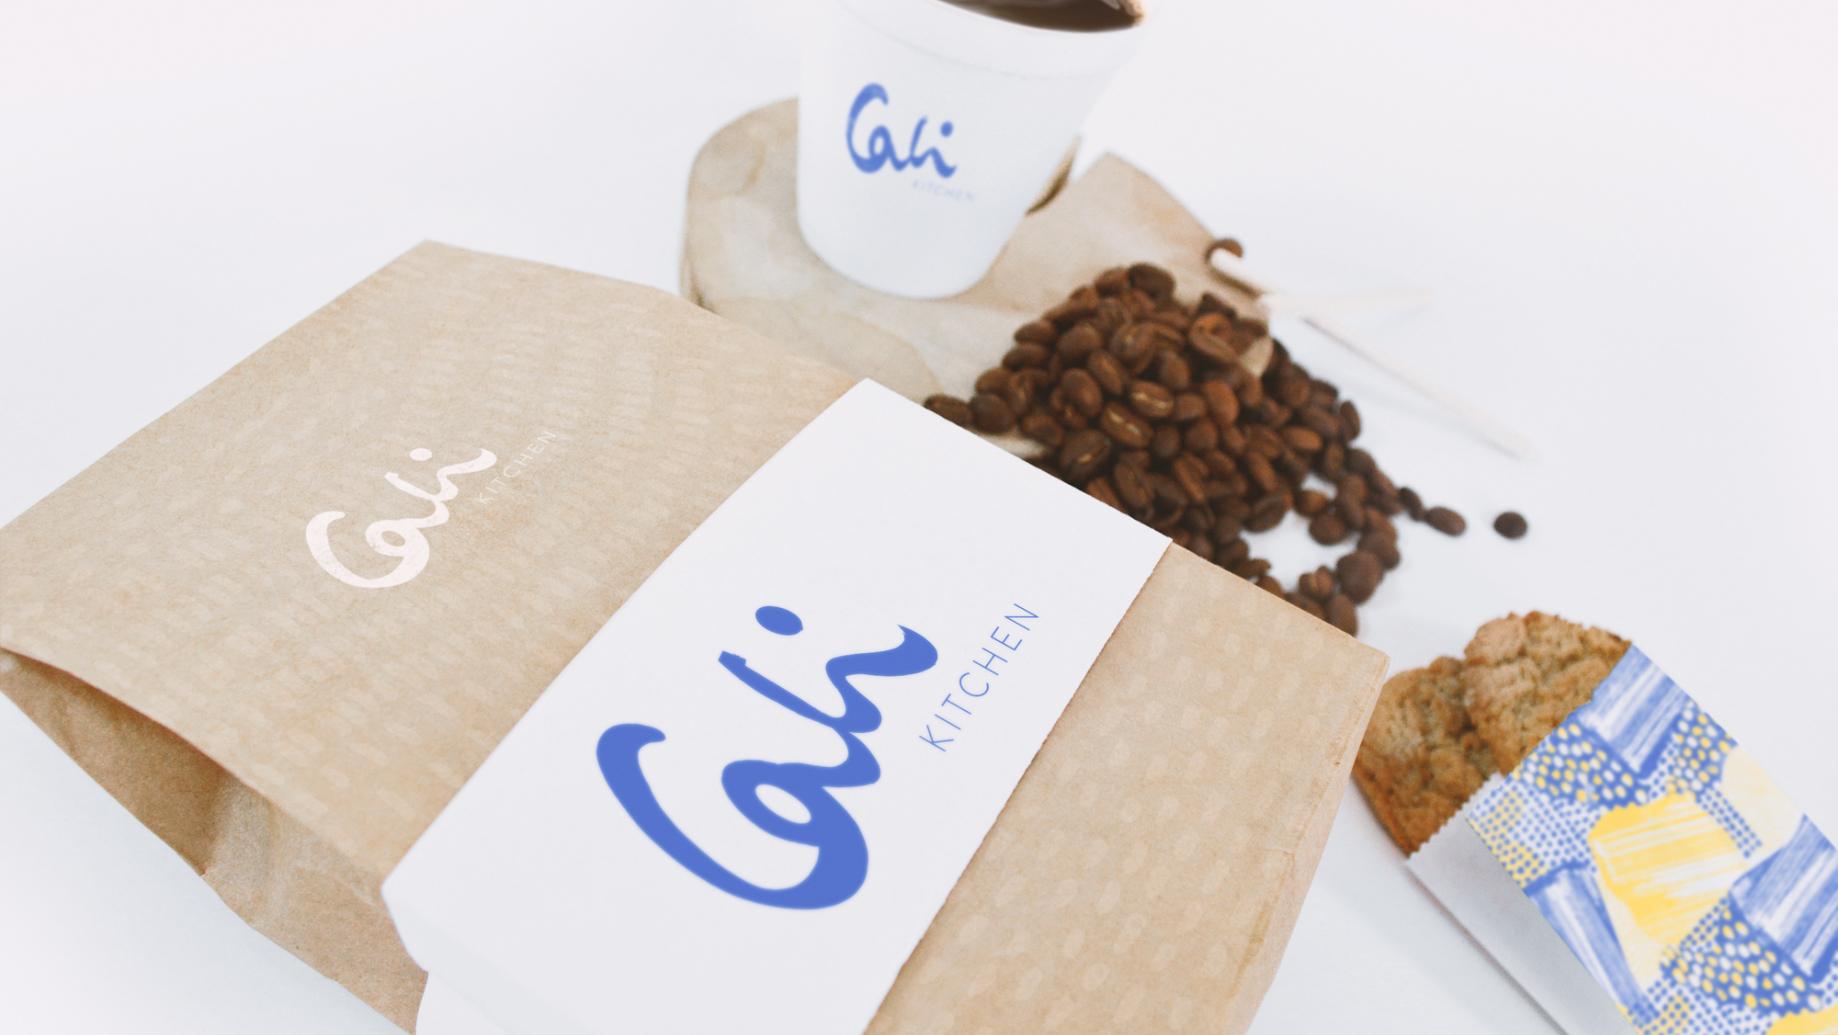 Cali-packaging-concept.jpg